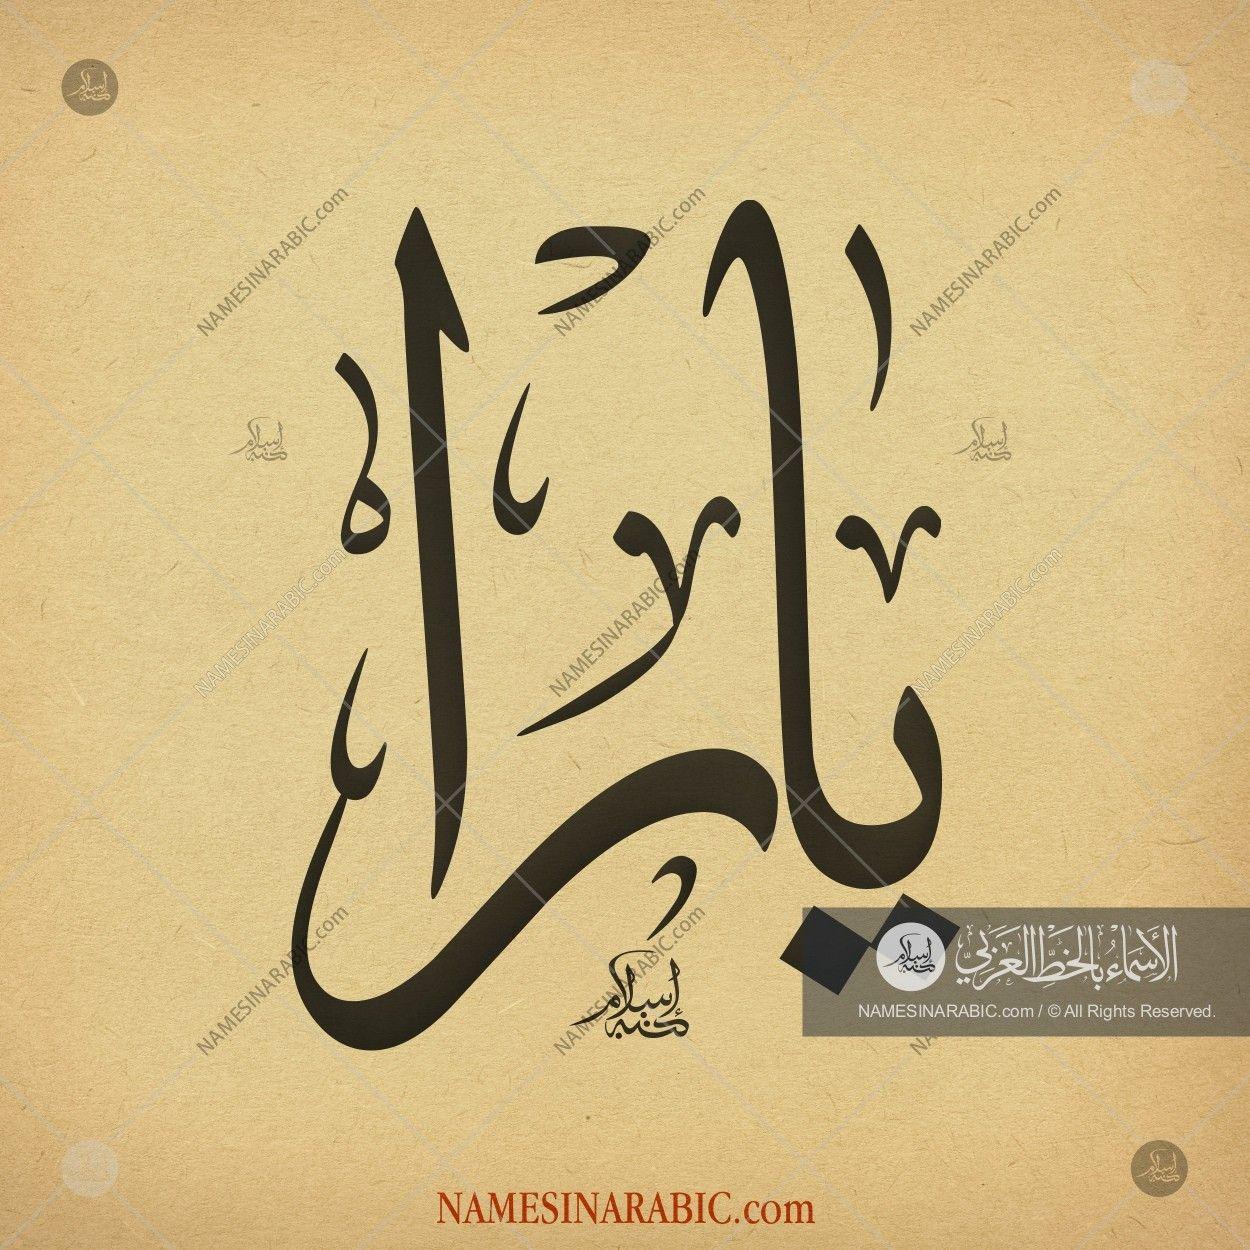 Yara يارا Names In Arabic Calligraphy Name 2832 Calligraphy Name Calligraphy Name Design Art